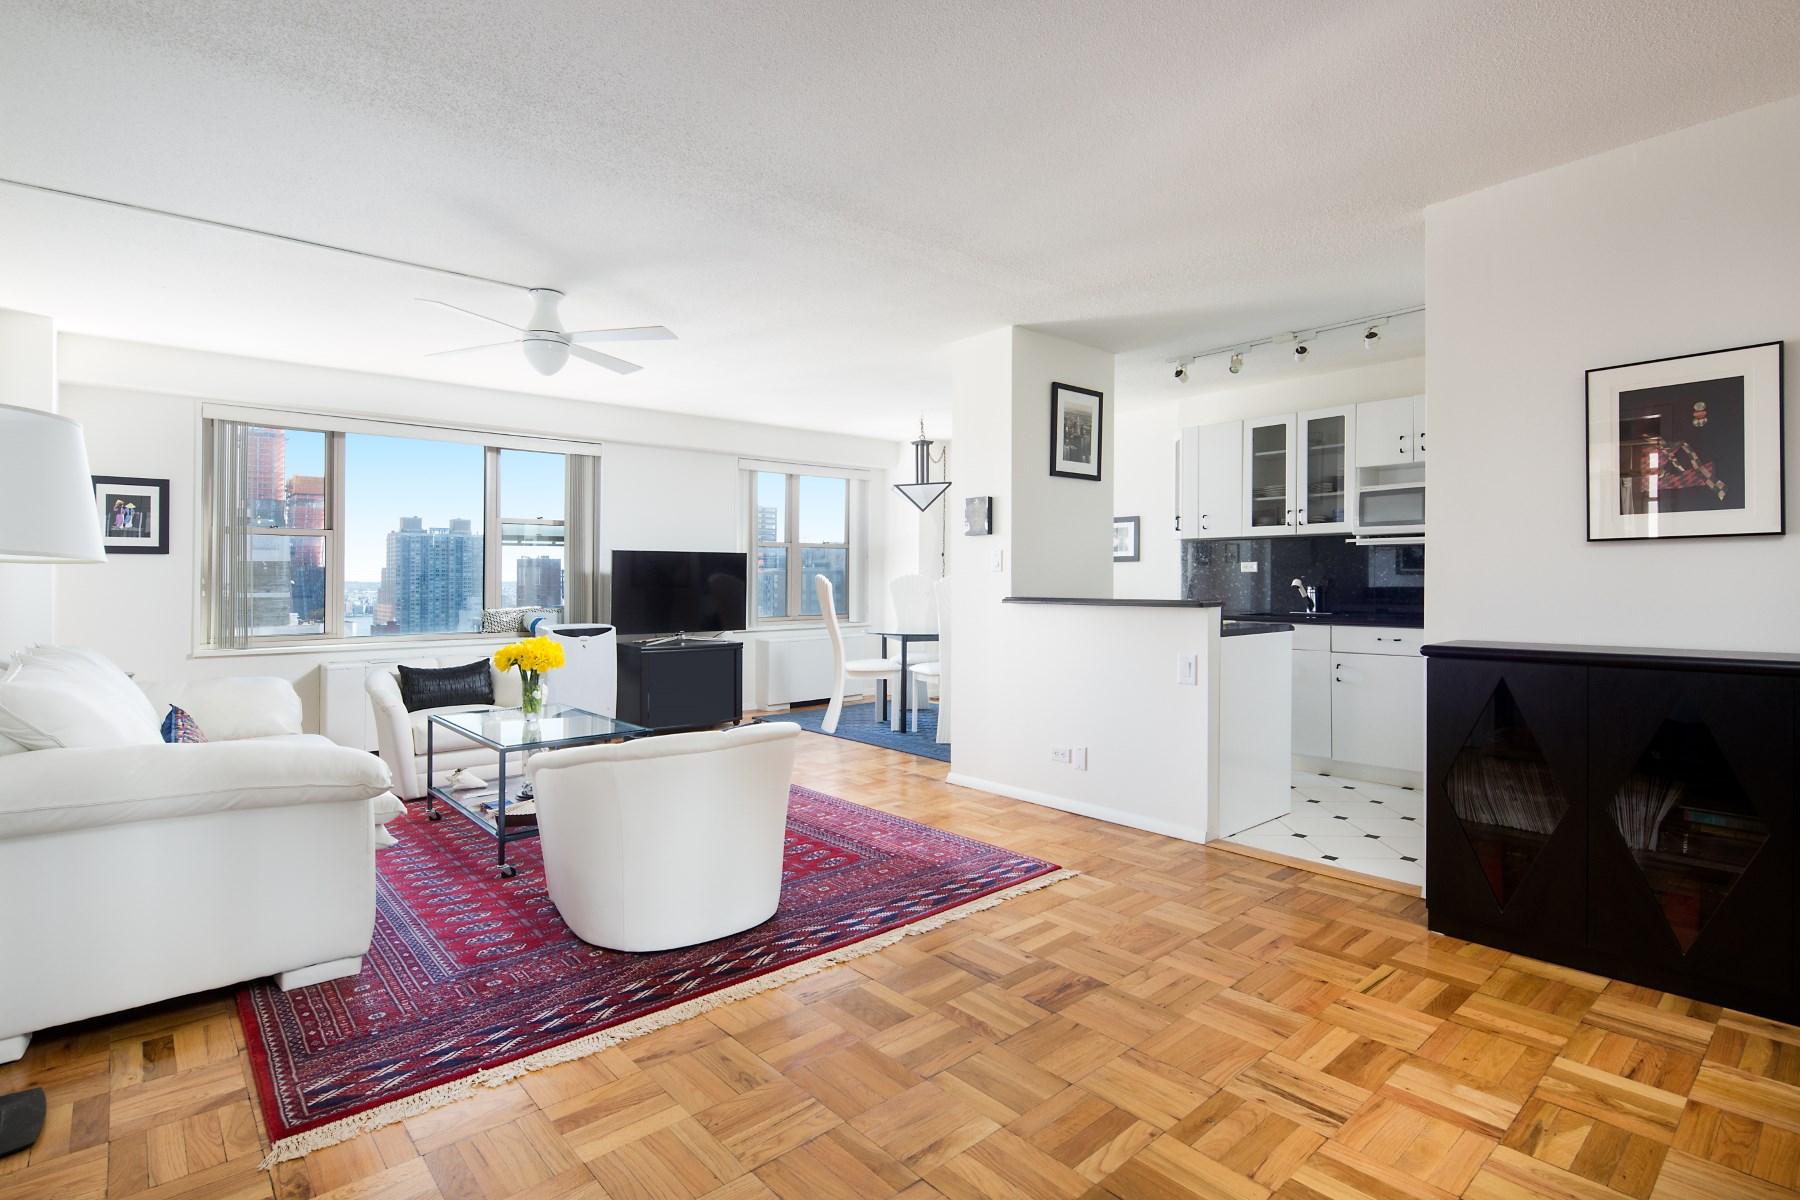 Кооперативная квартира для того Продажа на 137 East 36th Street, Apt 19C 137 East 36th Street Apt 19C Murray Hill, New York, Нью-Йорк, 10016 Соединенные Штаты